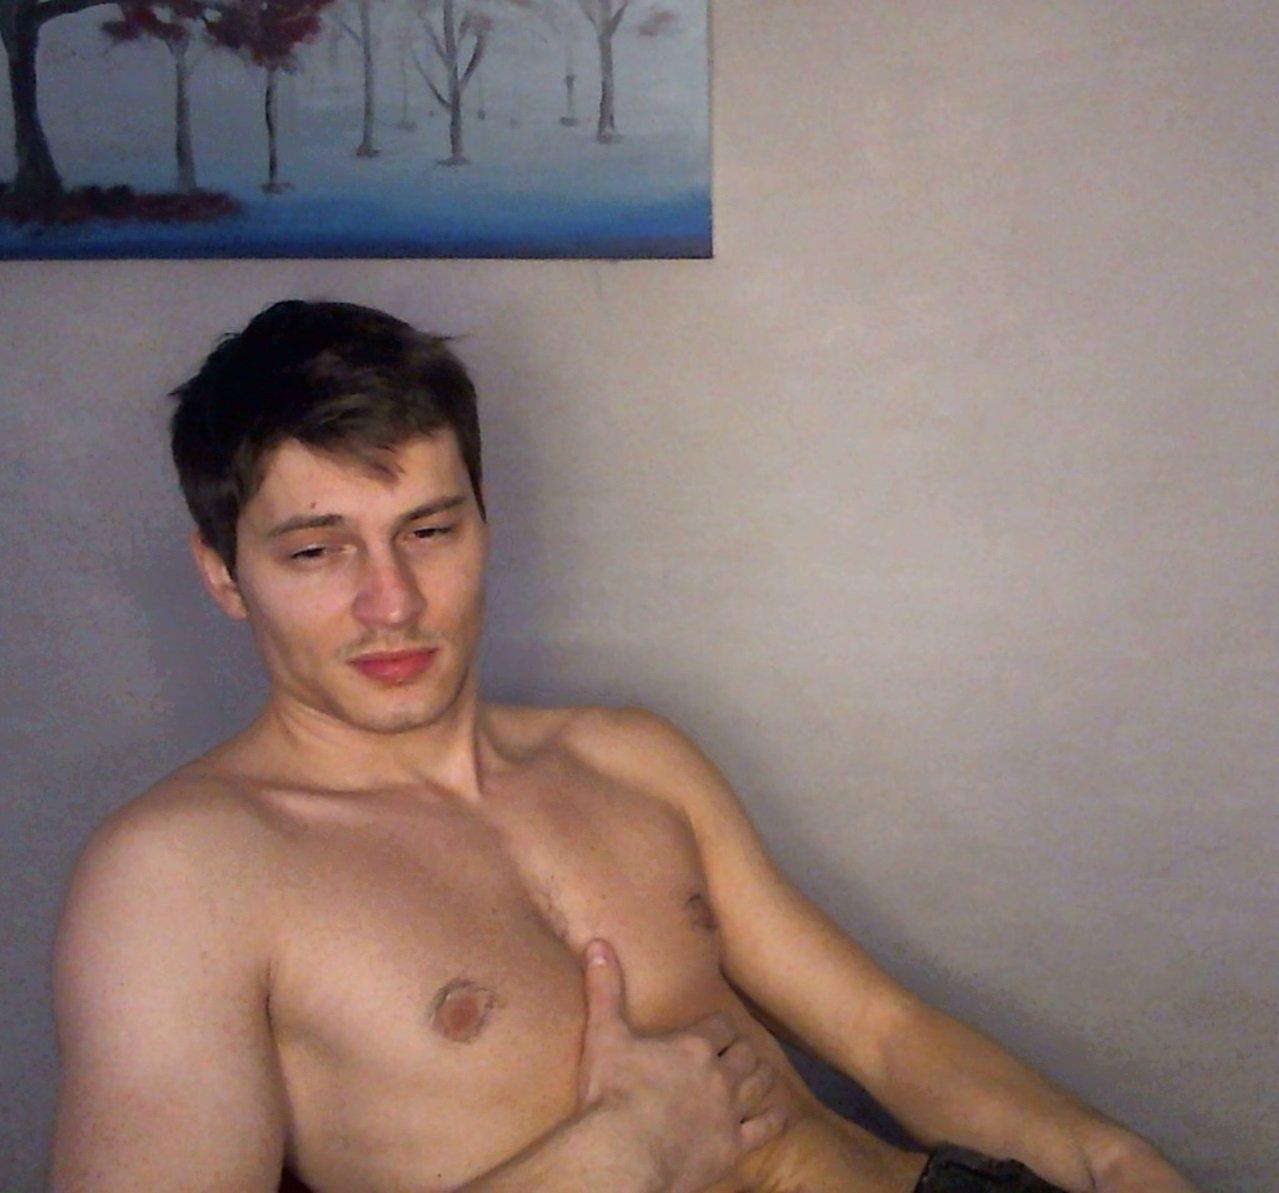 gay telefon sex chat line crna dama analni seks